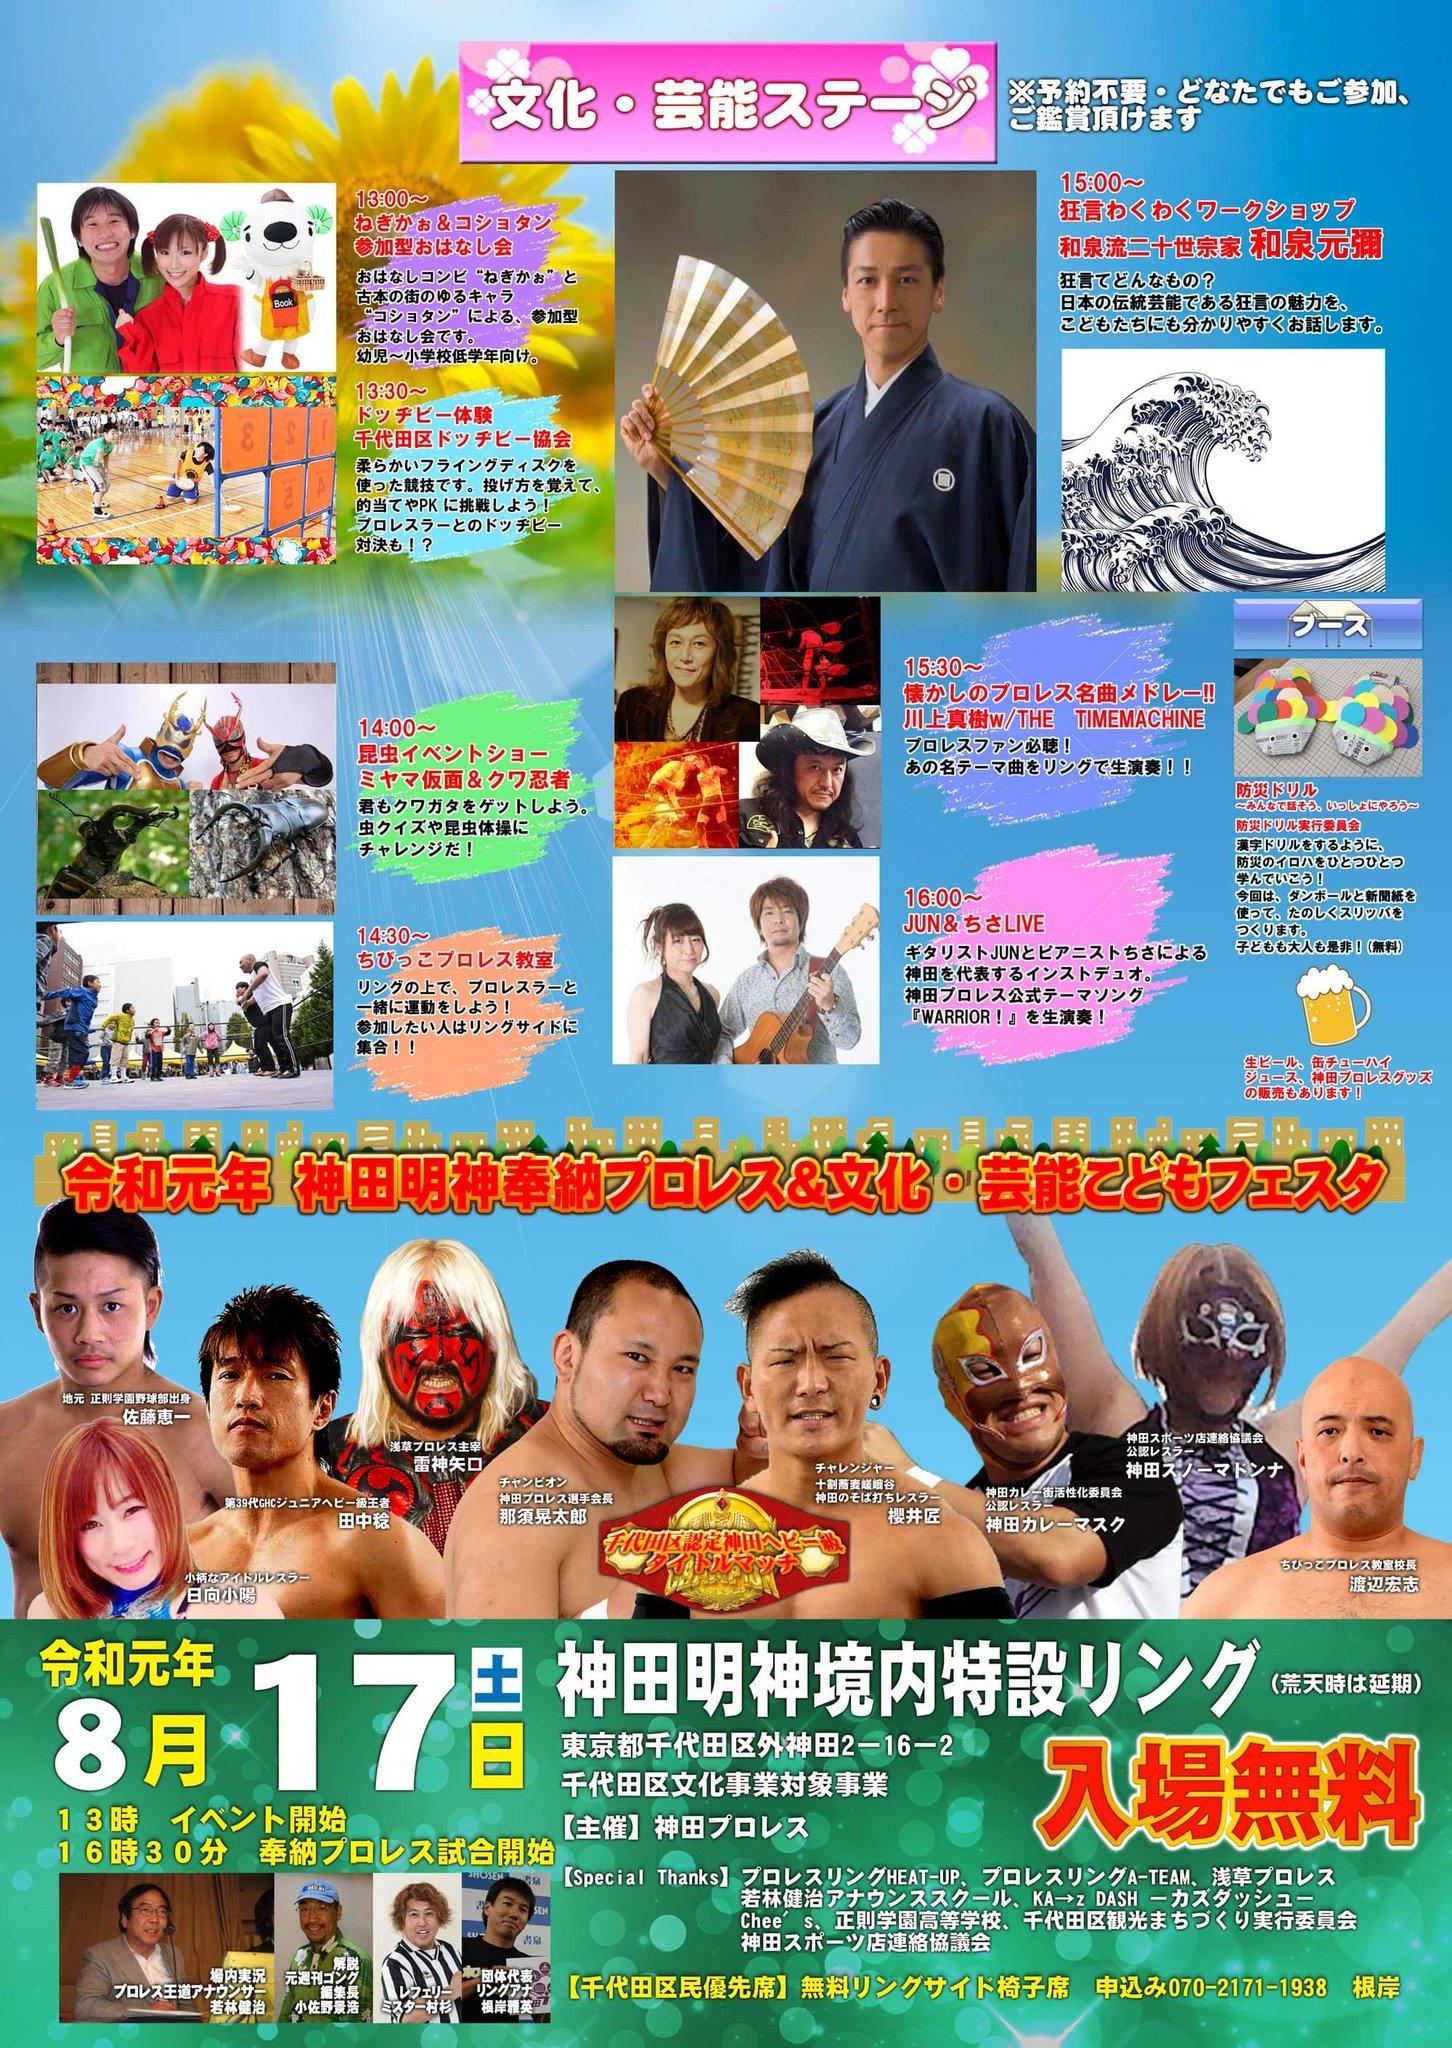 2019 Kanda Myojin dedication professional wrestling & culture, entertainment child Festa